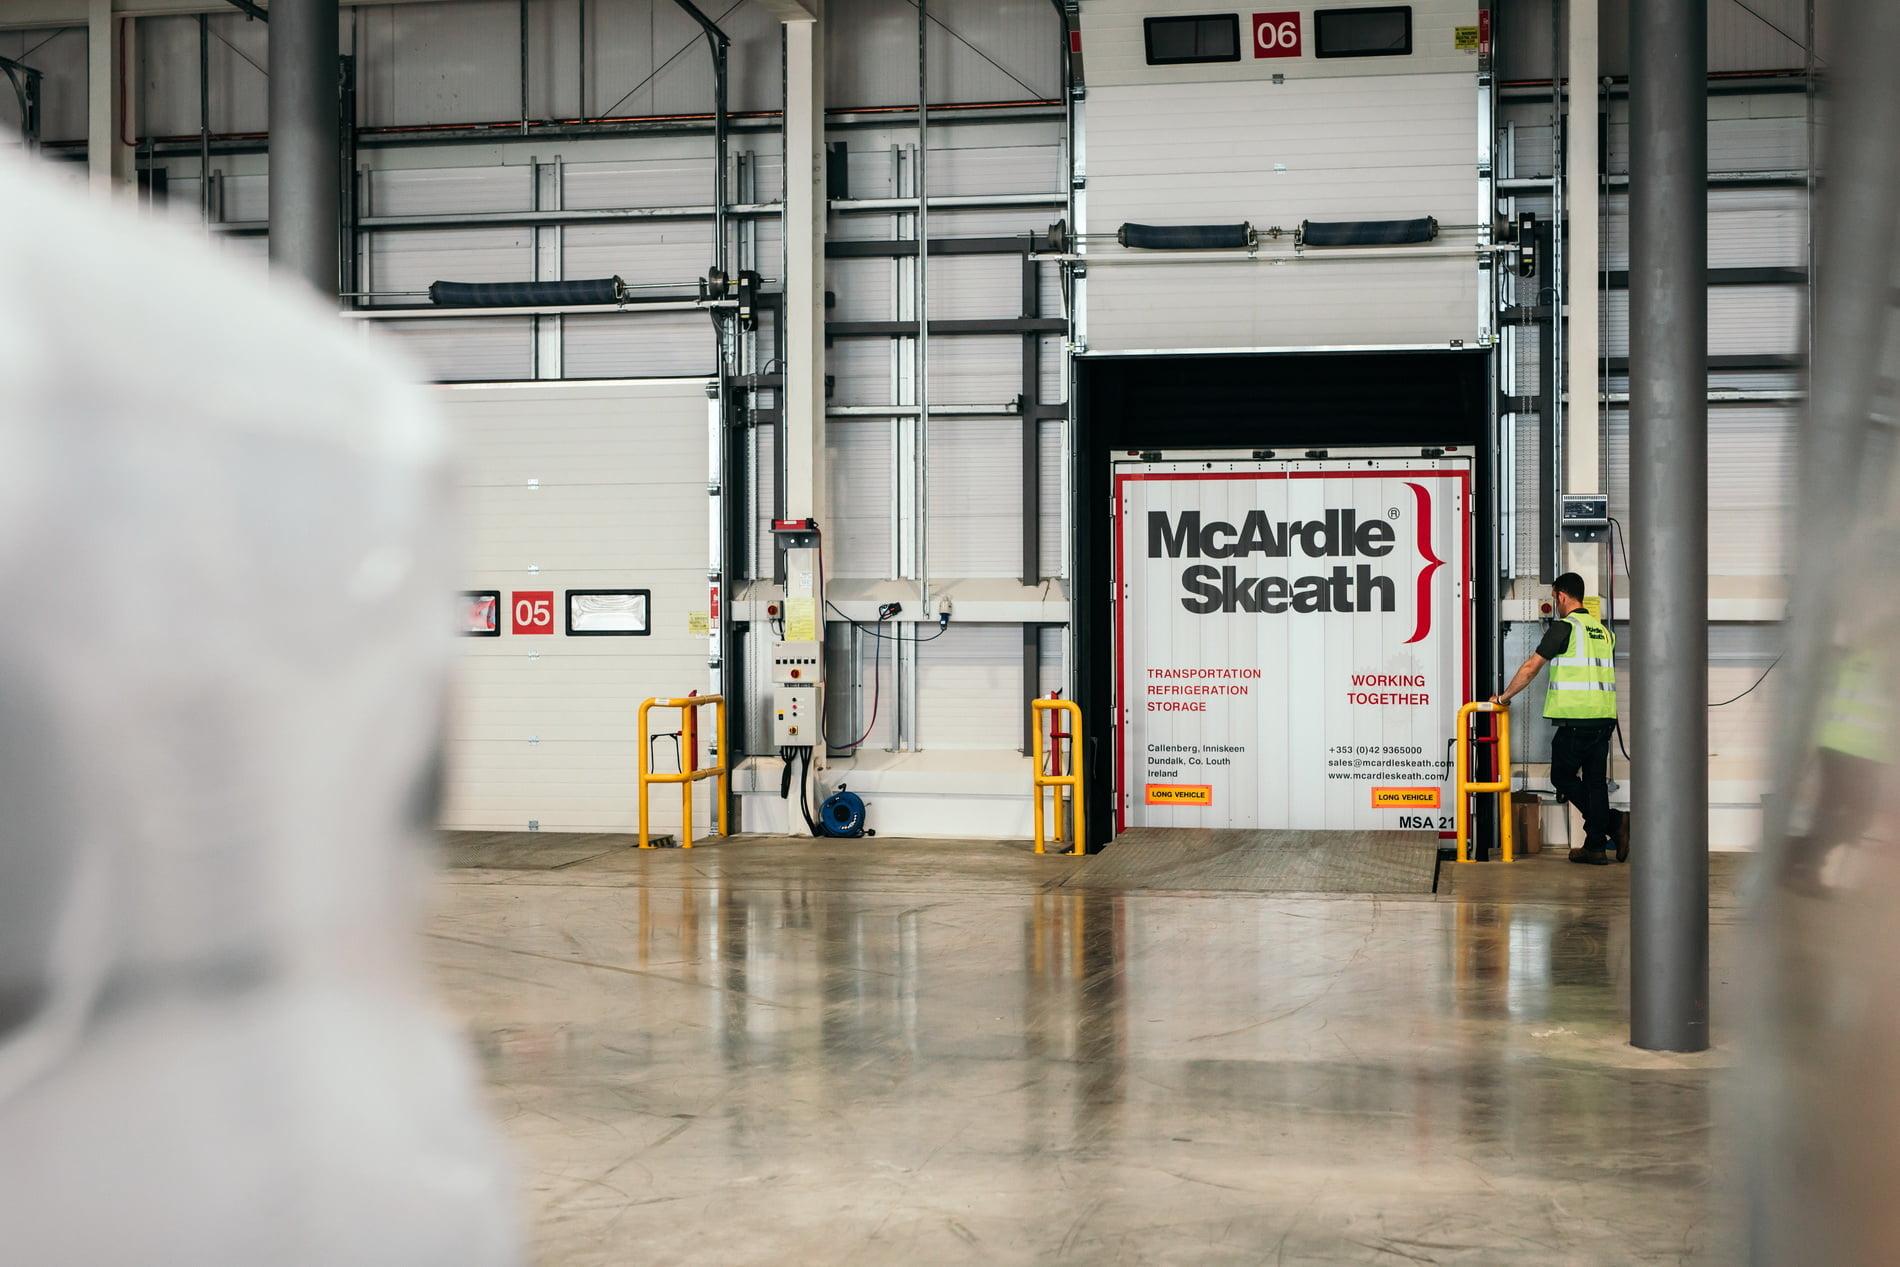 Meegan builders - Mcardle Skeath warehouse facility Hollystown, Dublin